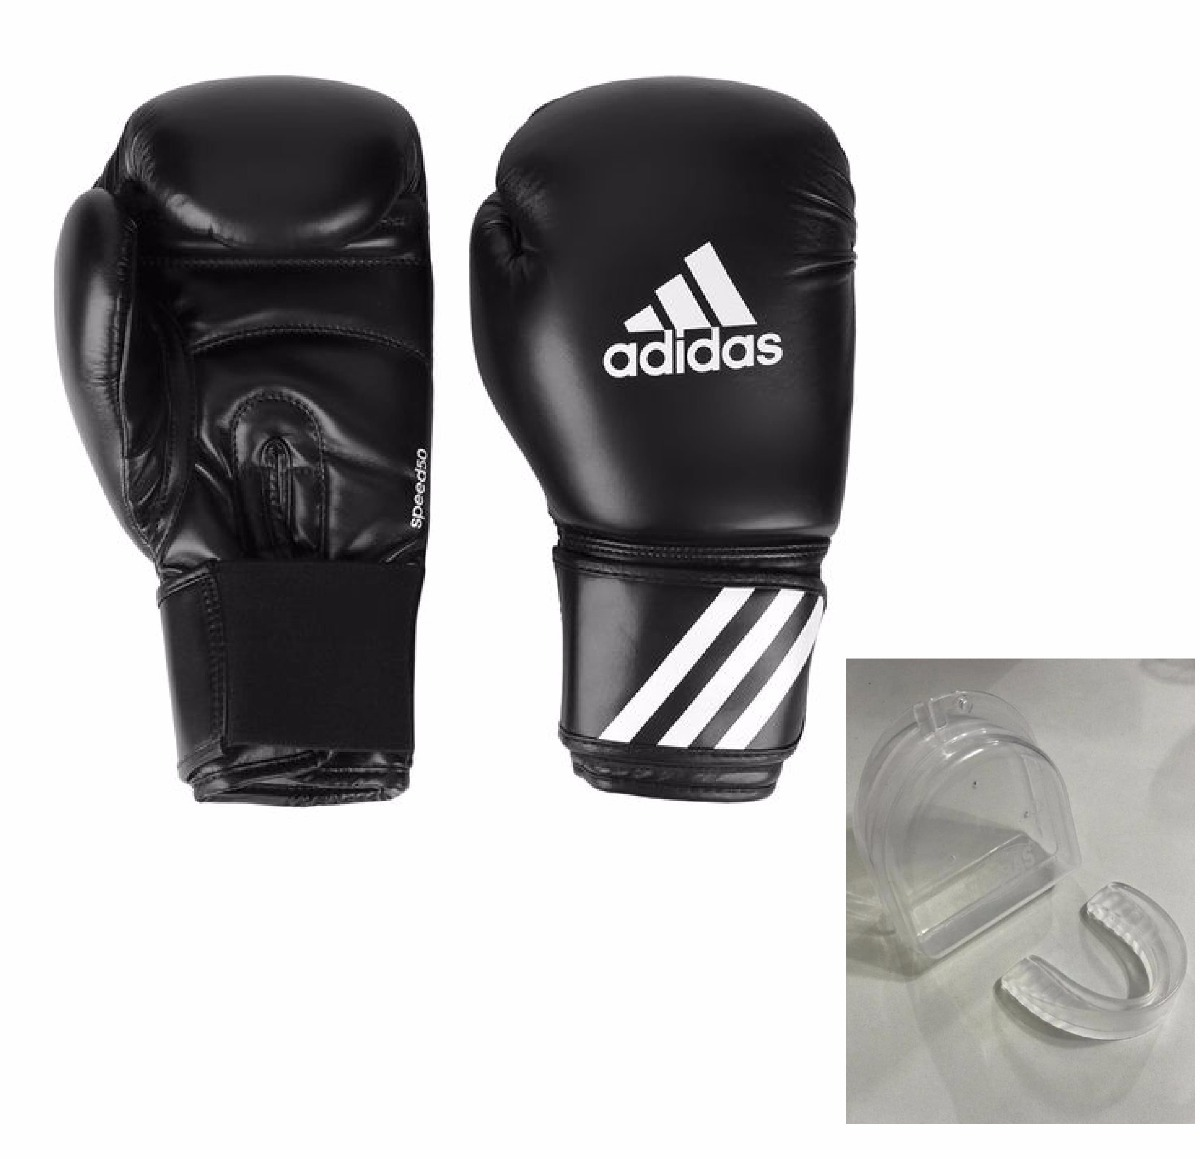 00454a349 luva boxe  muay thai adidas speed 50 preta 10oz+bucal brinde. Carregando  zoom.